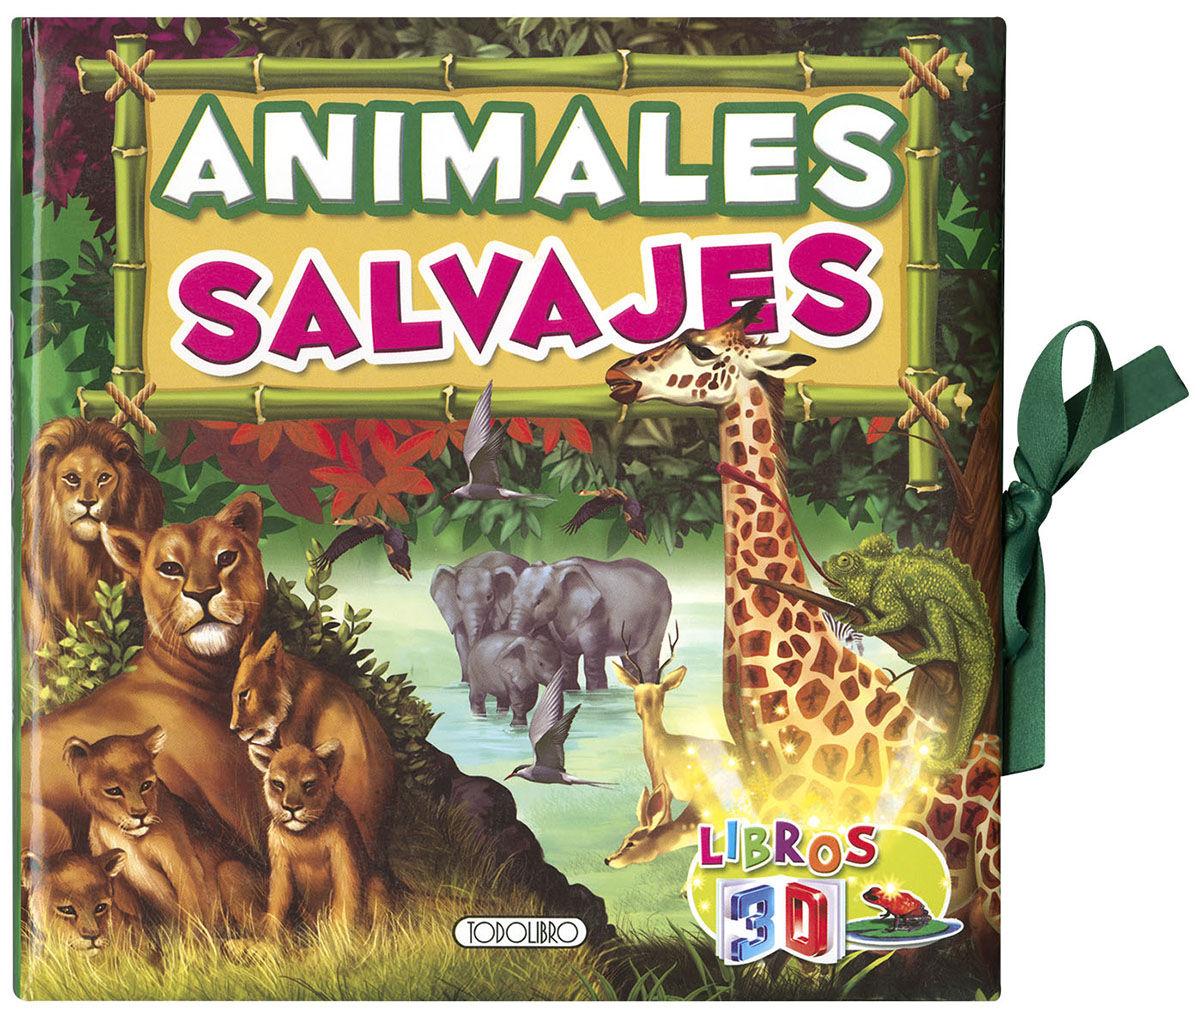 ANIMALES SALVAJES LIBROS 3D